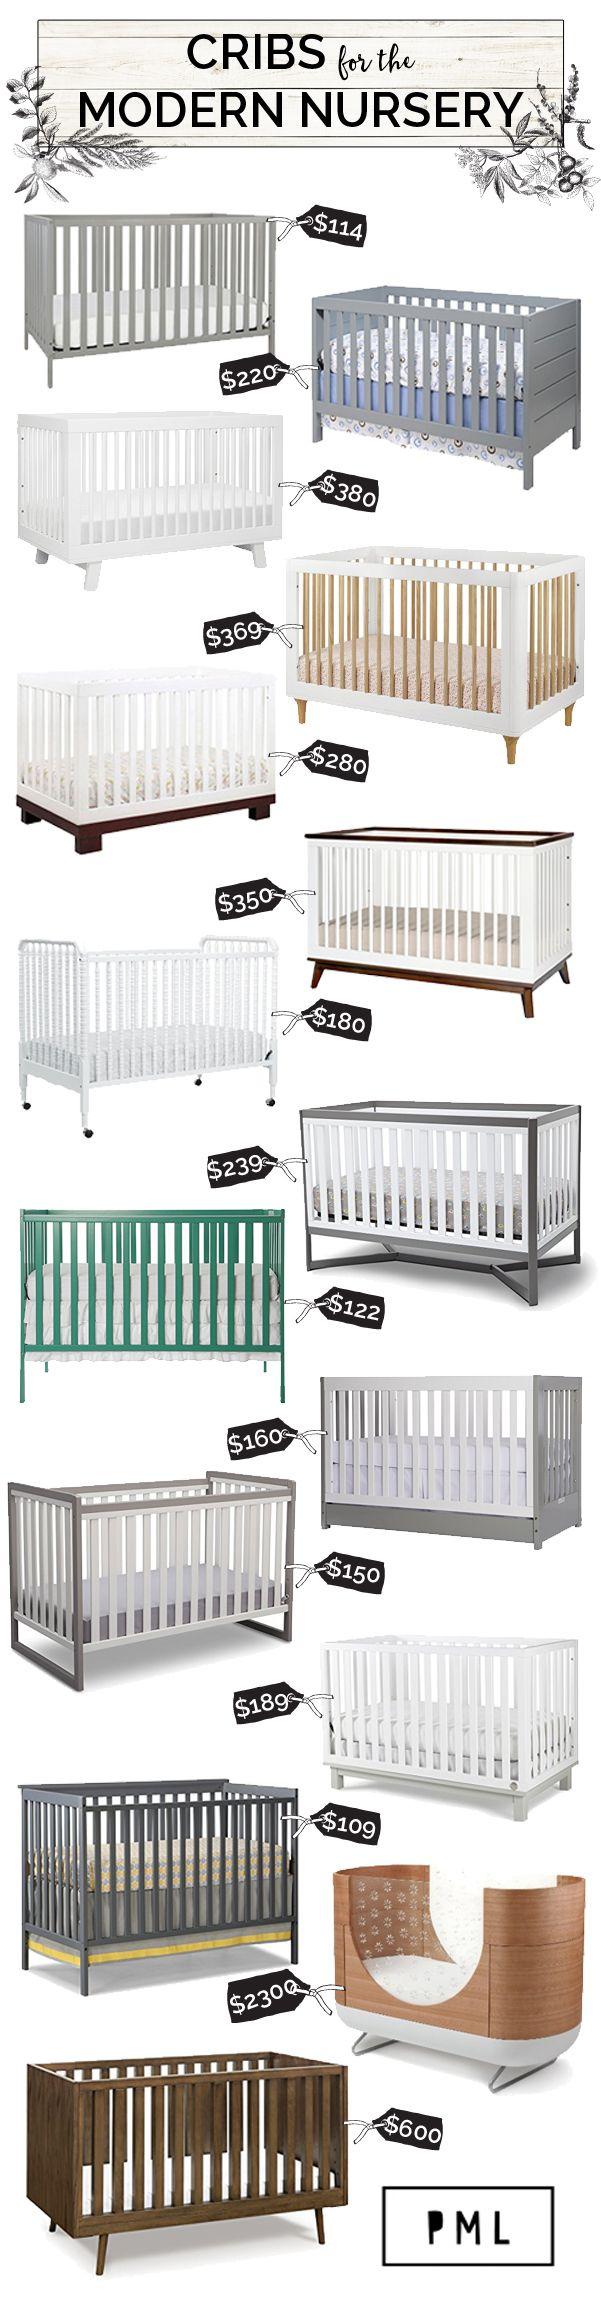 Cribs for the modern nursery | Petite Modern Life